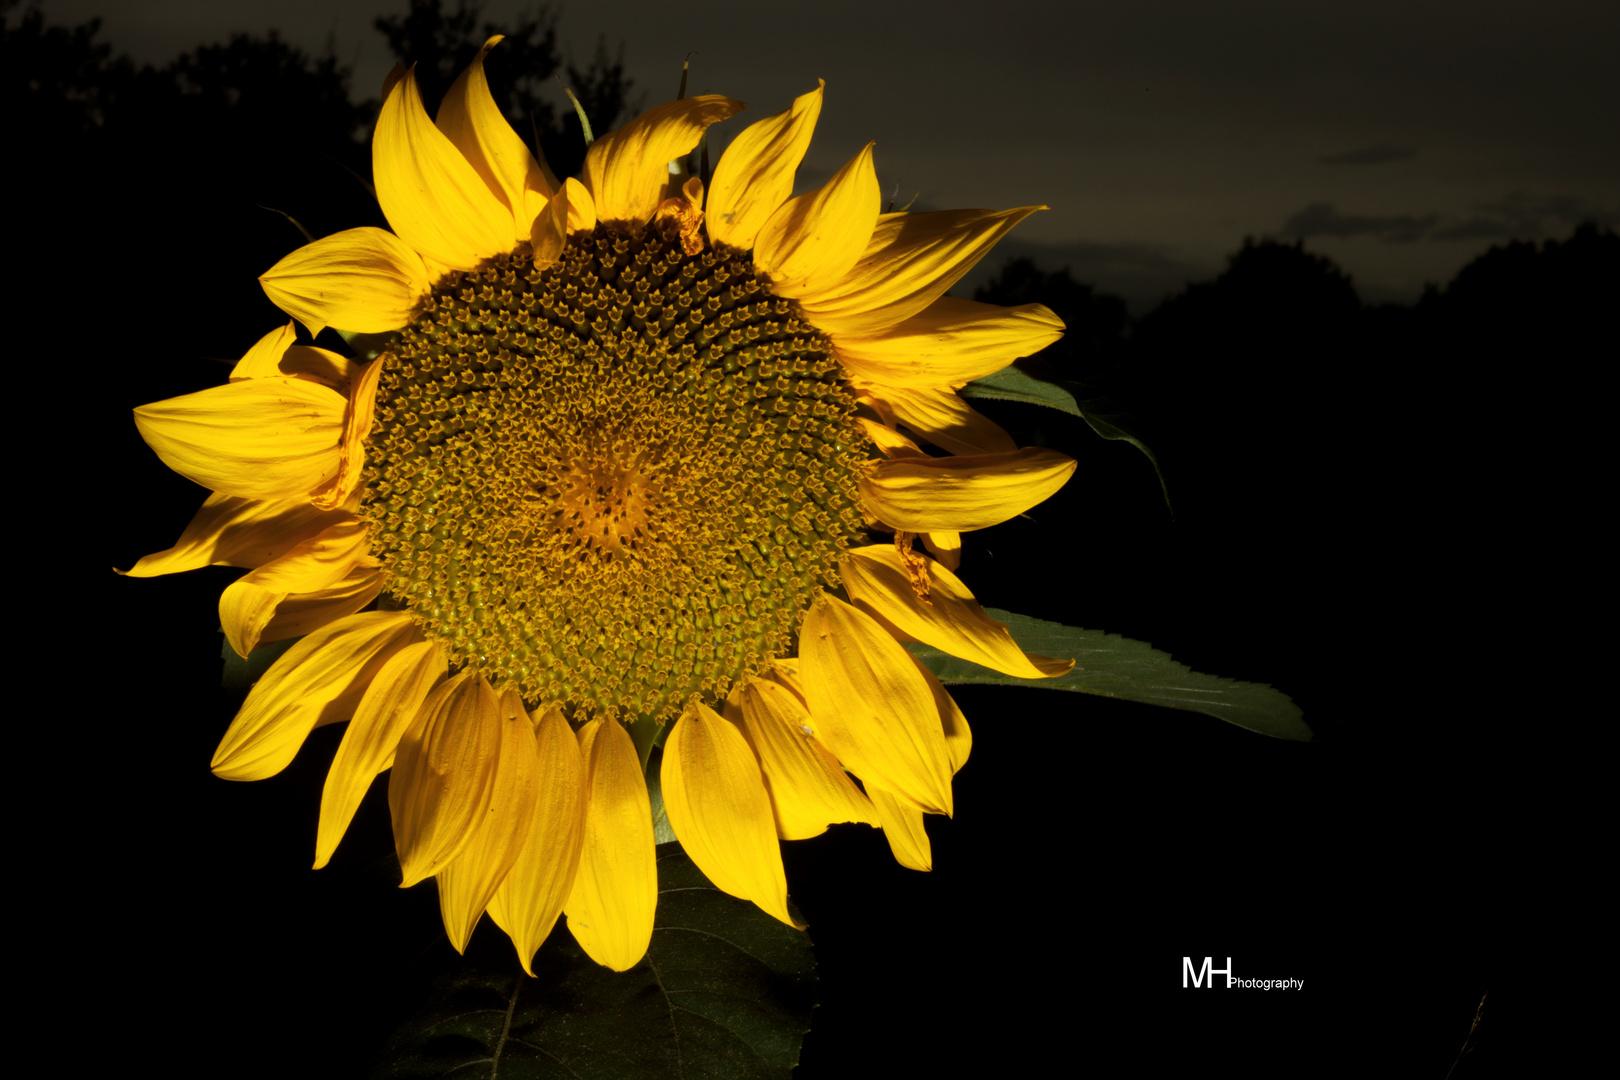 sonnenblume nachts